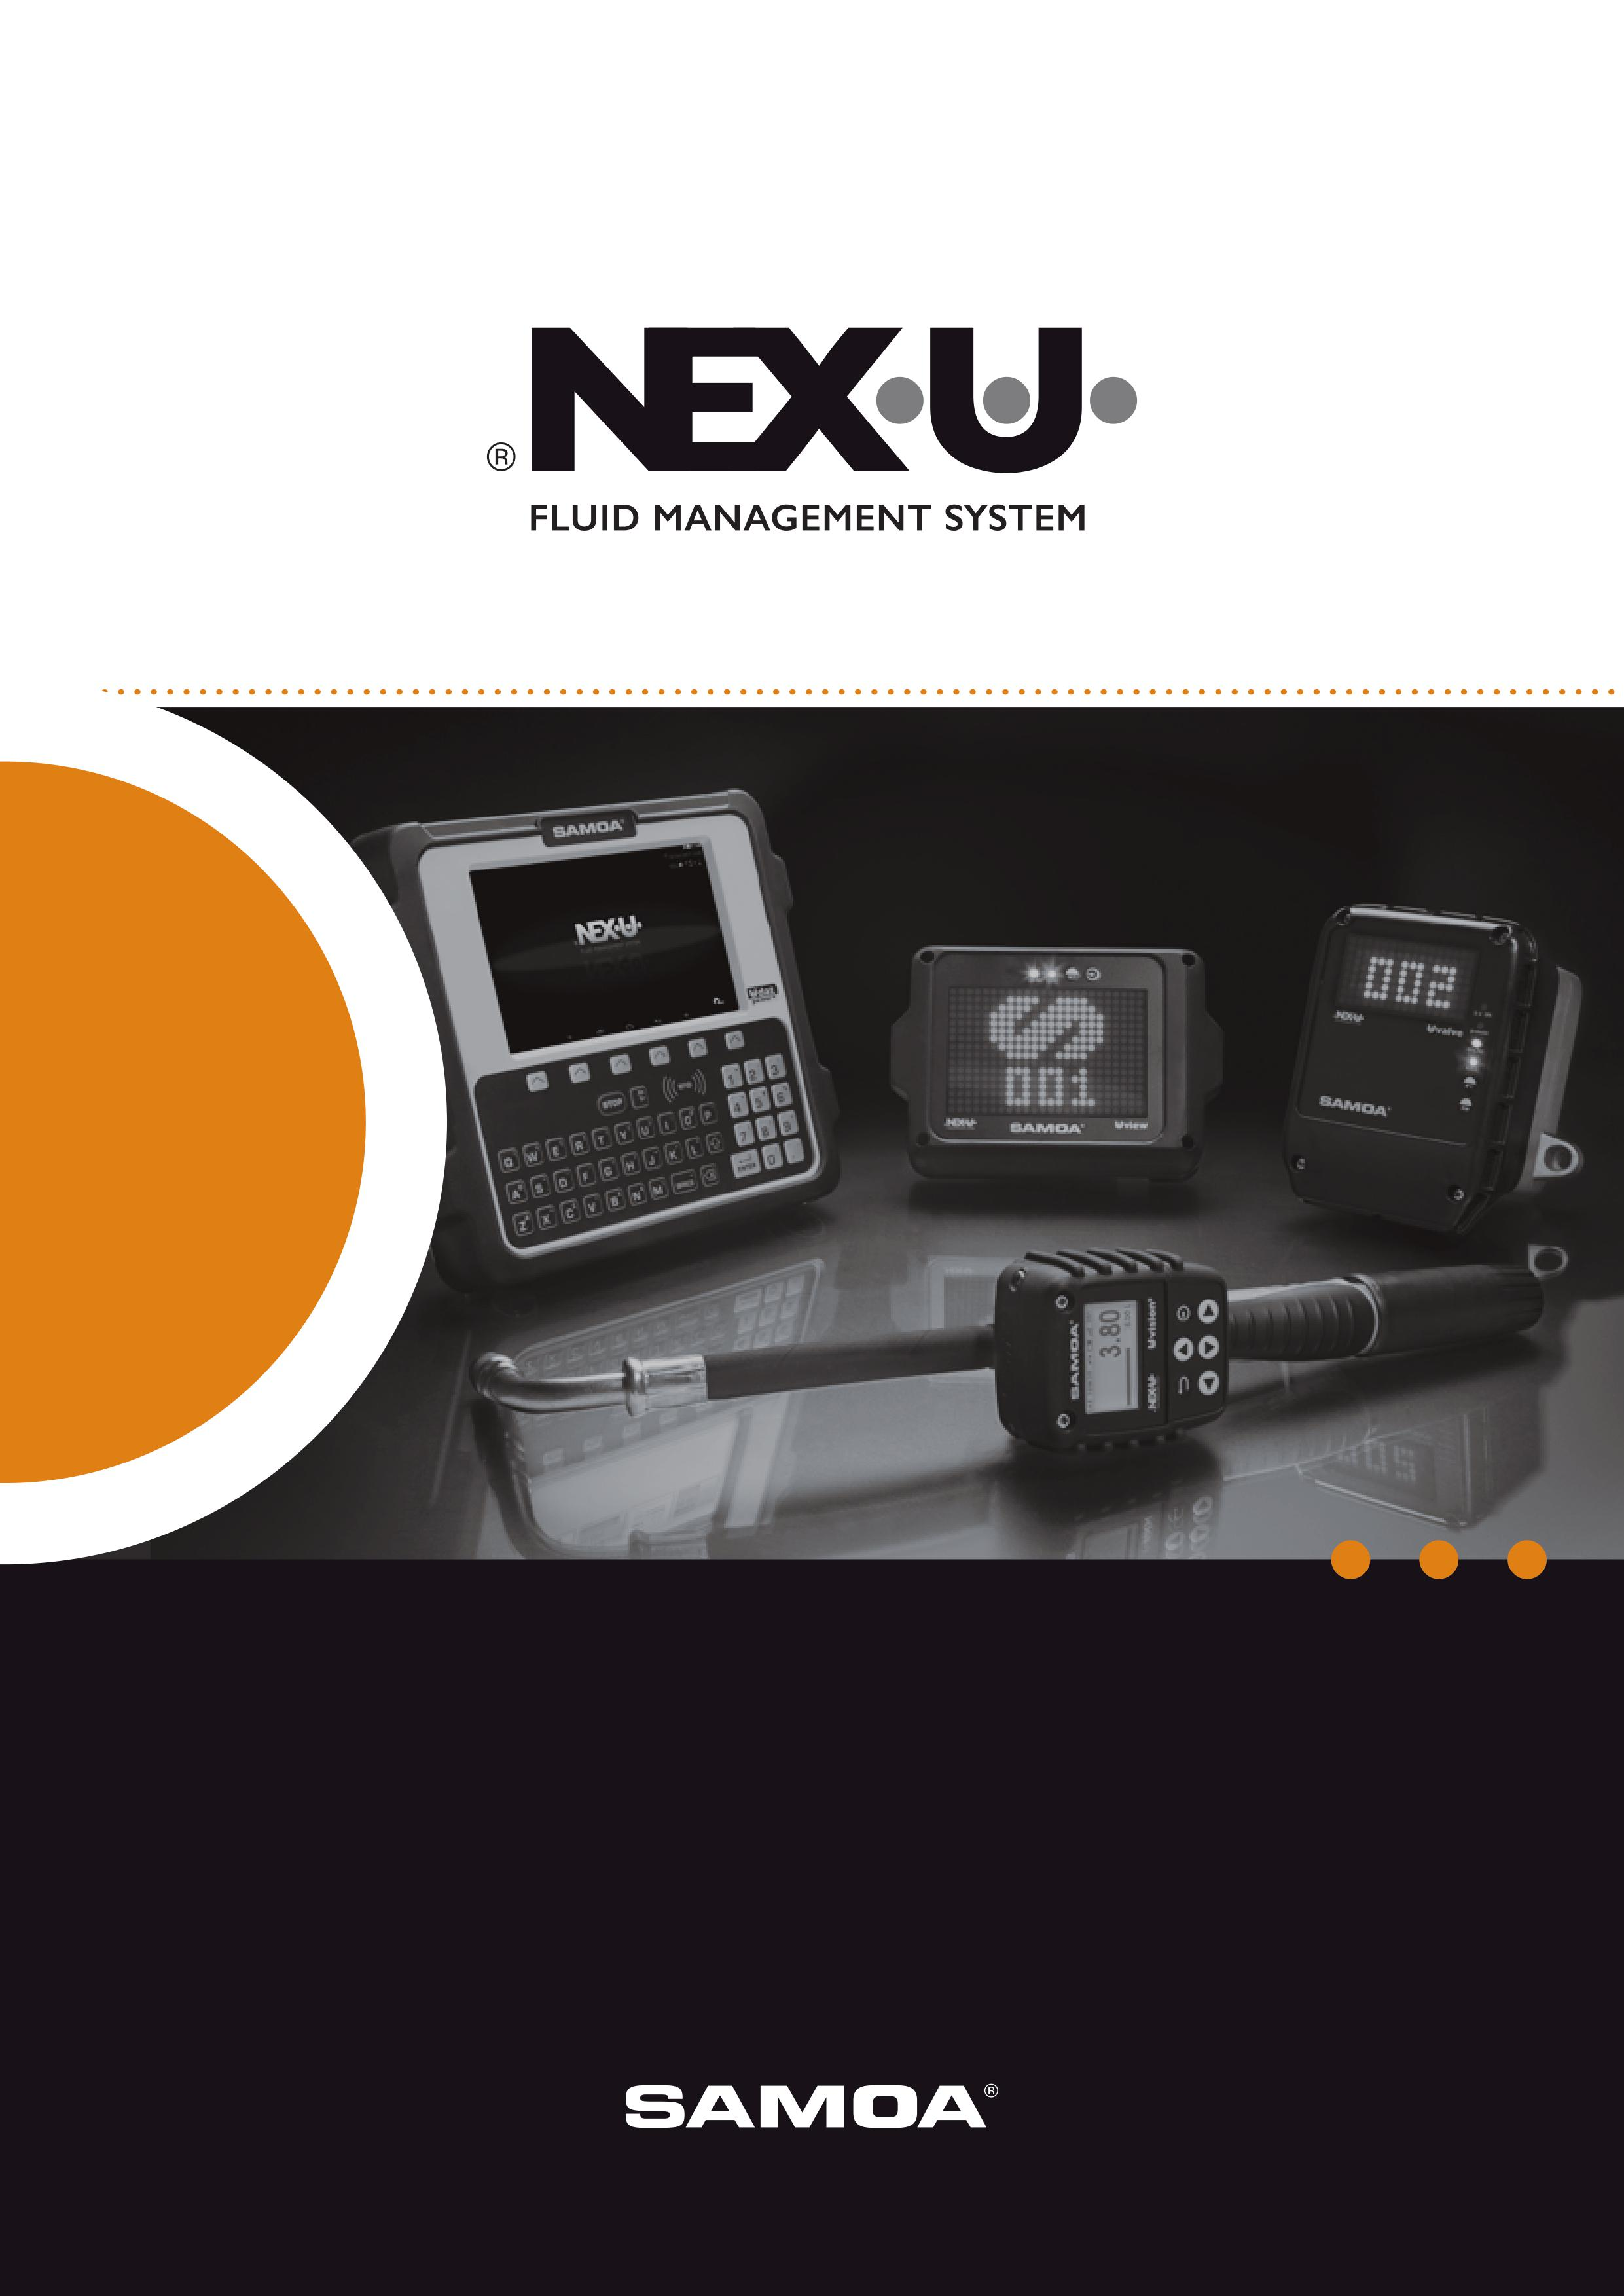 SAMOA NEXU Oil Monitoring Brochure Cover